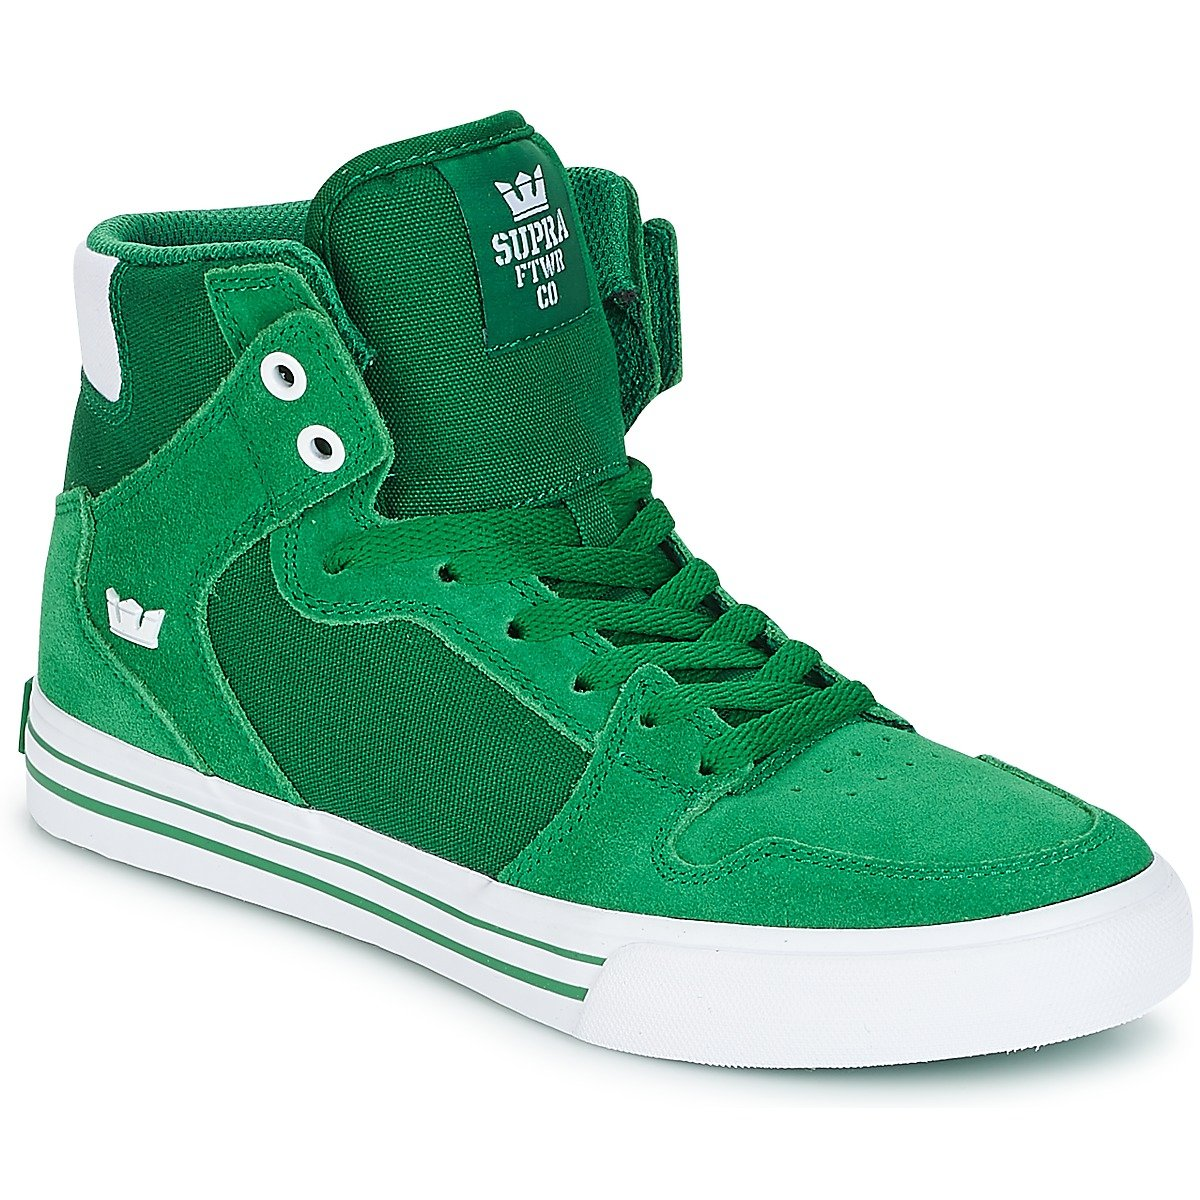 Supra Vaider LC Sneaker B074KLPXMP 8.5 M US|Green-white